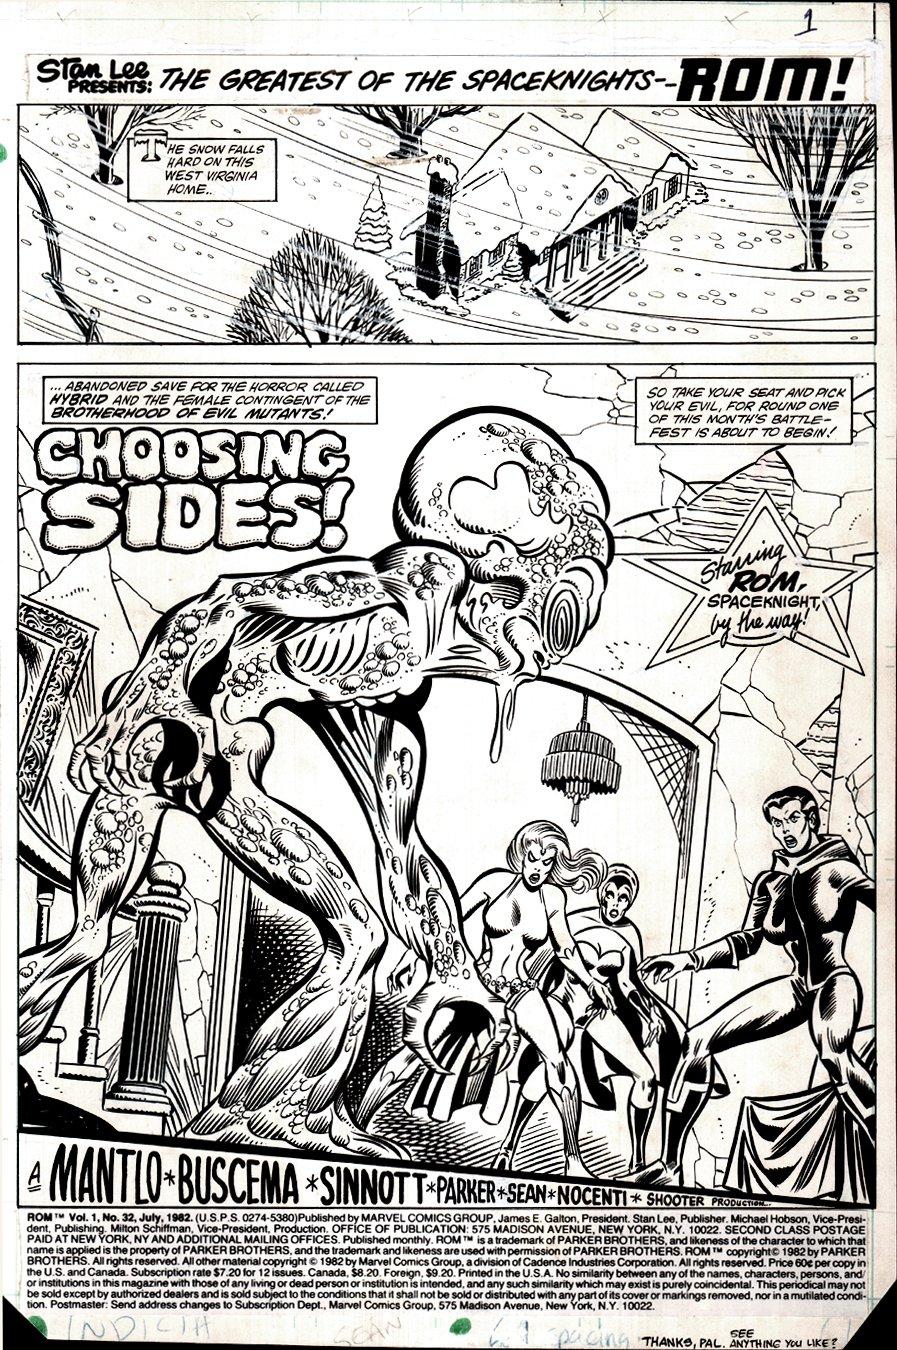 ROM #32 p 1 SPLASH ('EARLY' ROGUE, MYSTIQUE, & DESTINY BATTLE HYBRID!) 1982